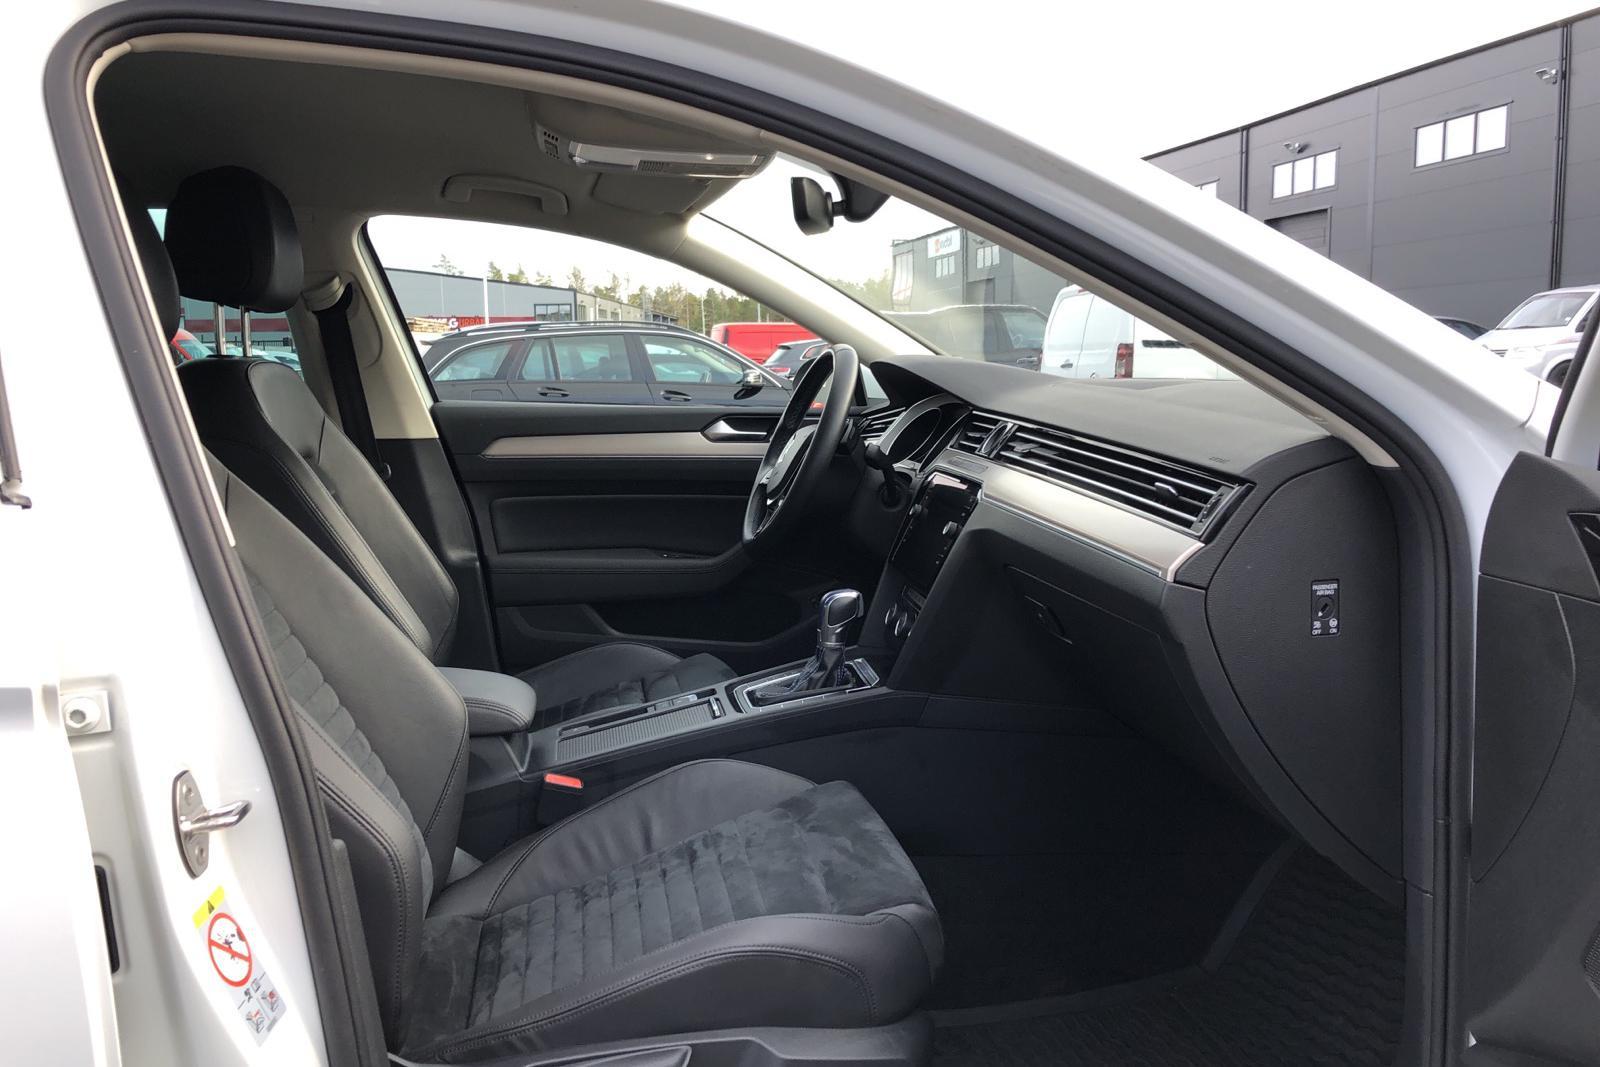 VW Passat 1.4 Plug-in-Hybrid Sportscombi  GTE (218hk) - 0 mil - Automat - vit - 2018